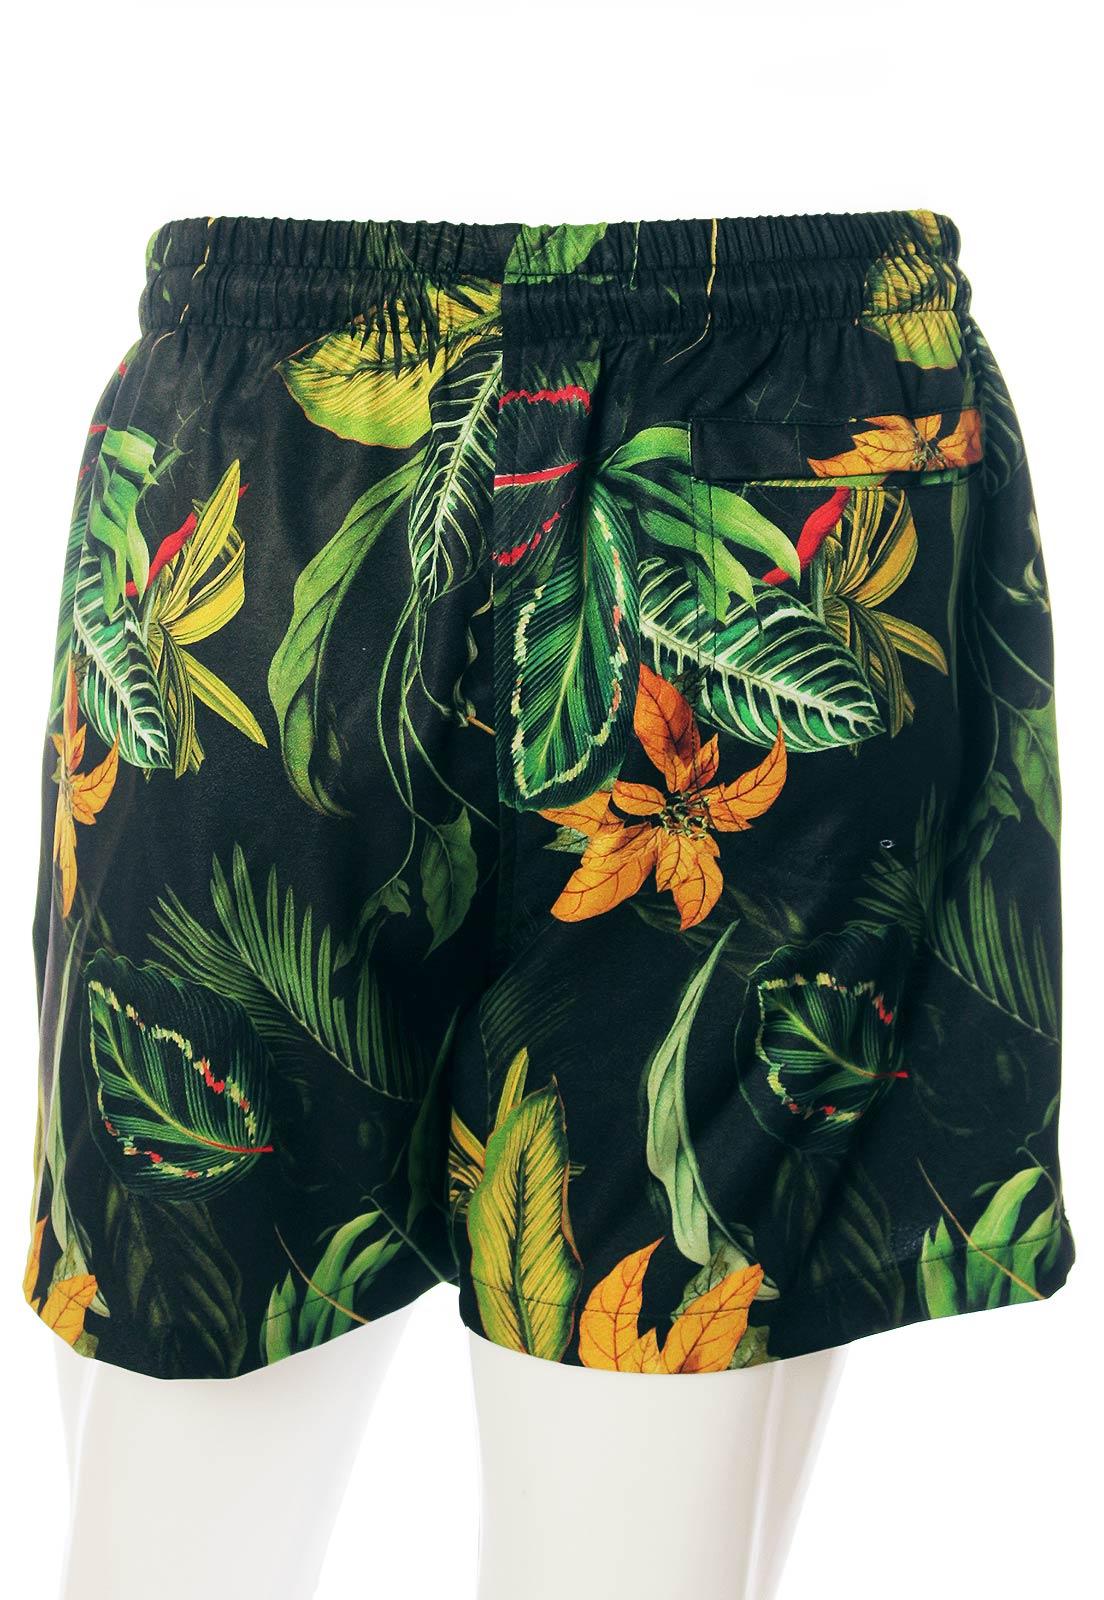 Shorts Estampado Floral Sem Gênero Selva Amazônica Verde